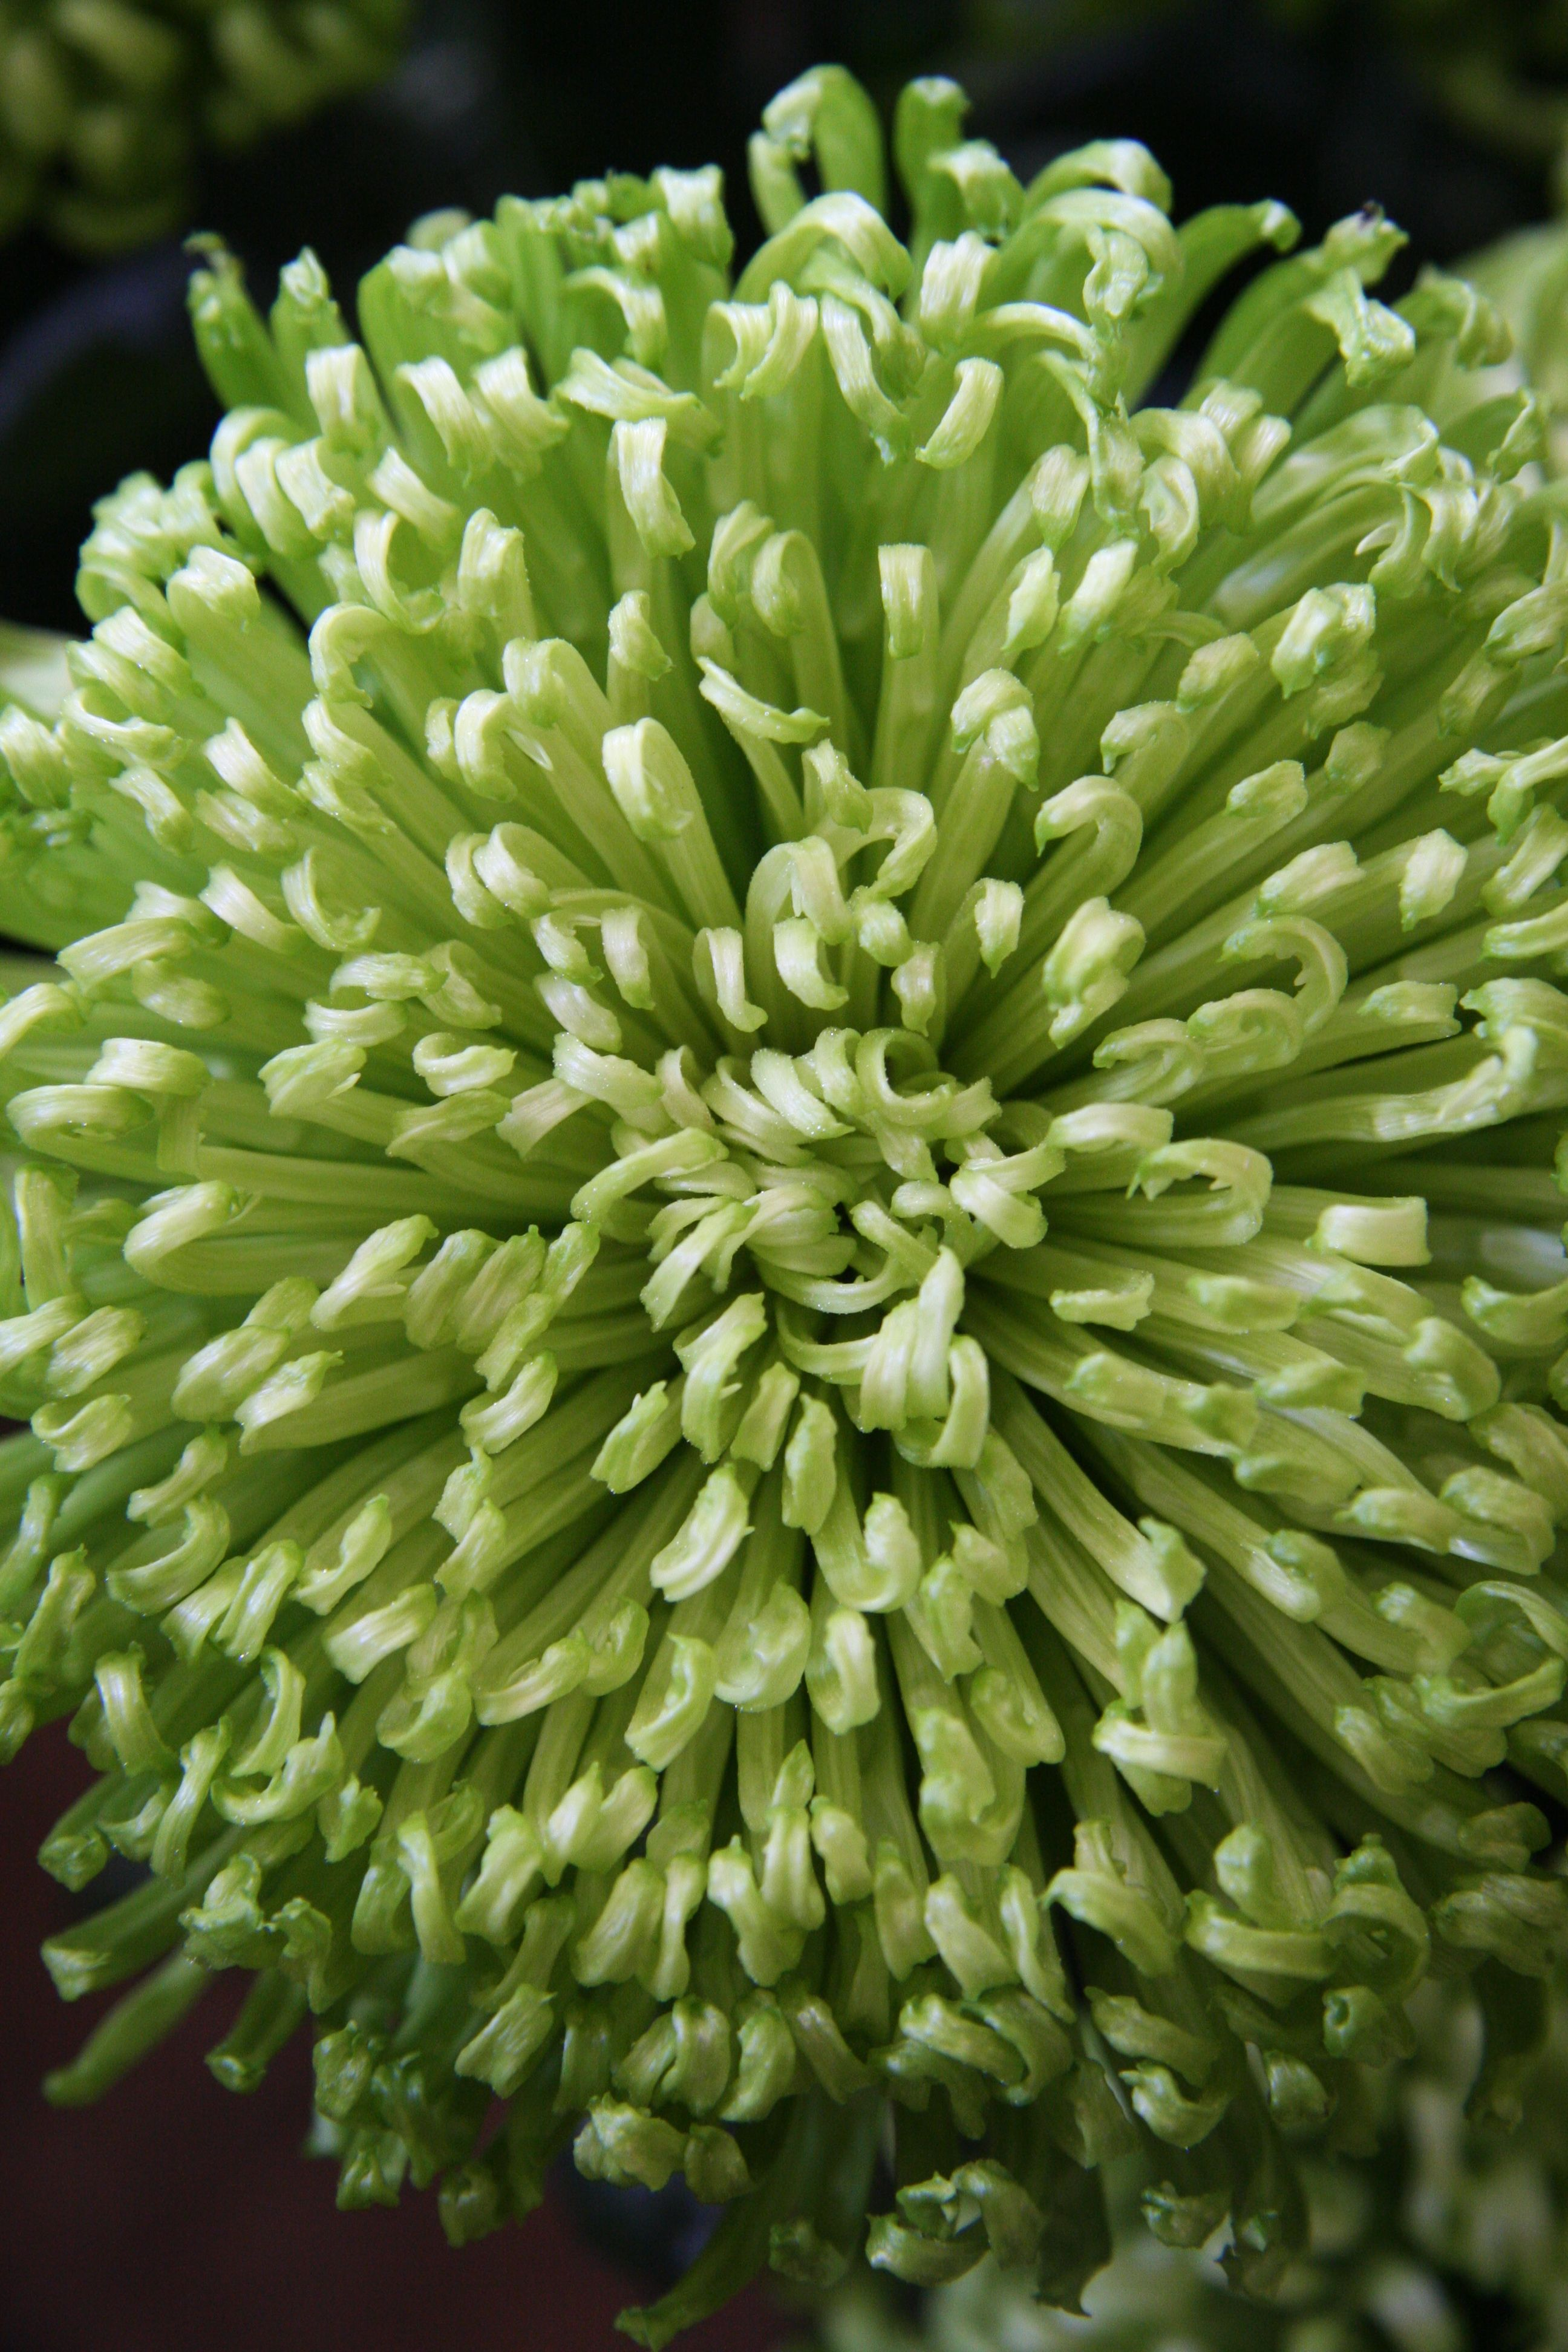 Anastasia chrysanthemum flowers ucucucucflowersueueueue pinterest